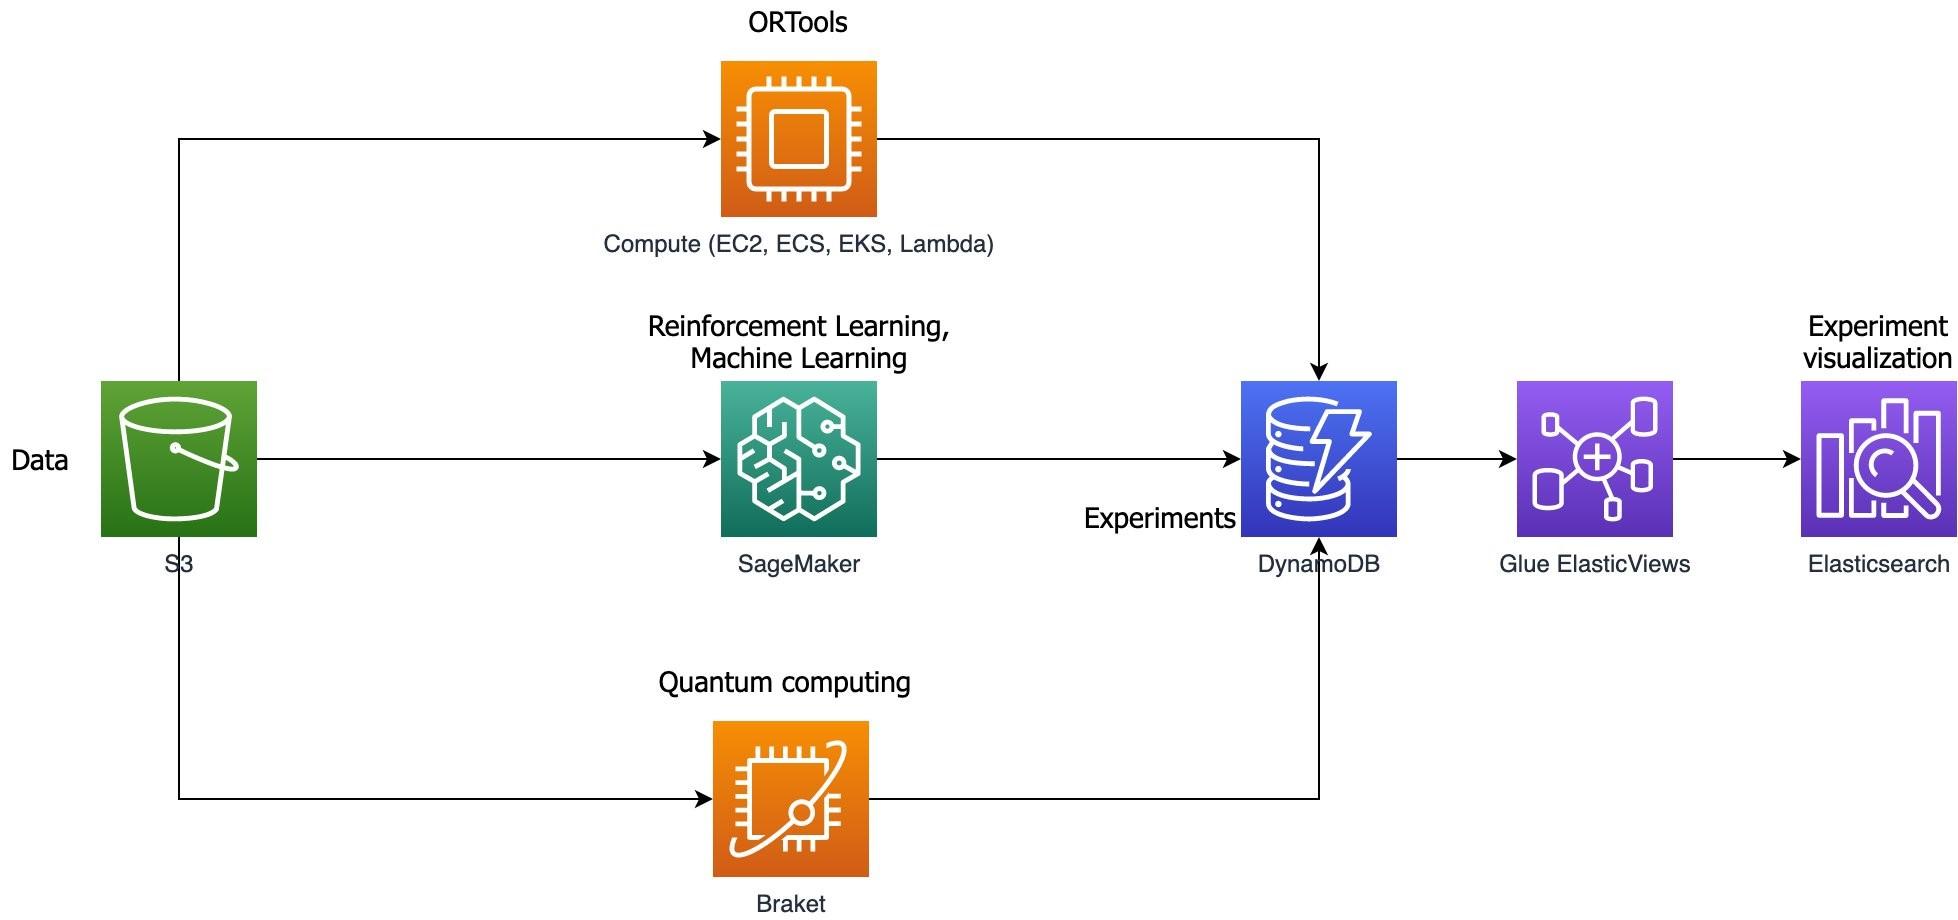 Figure 1. OR optimization options